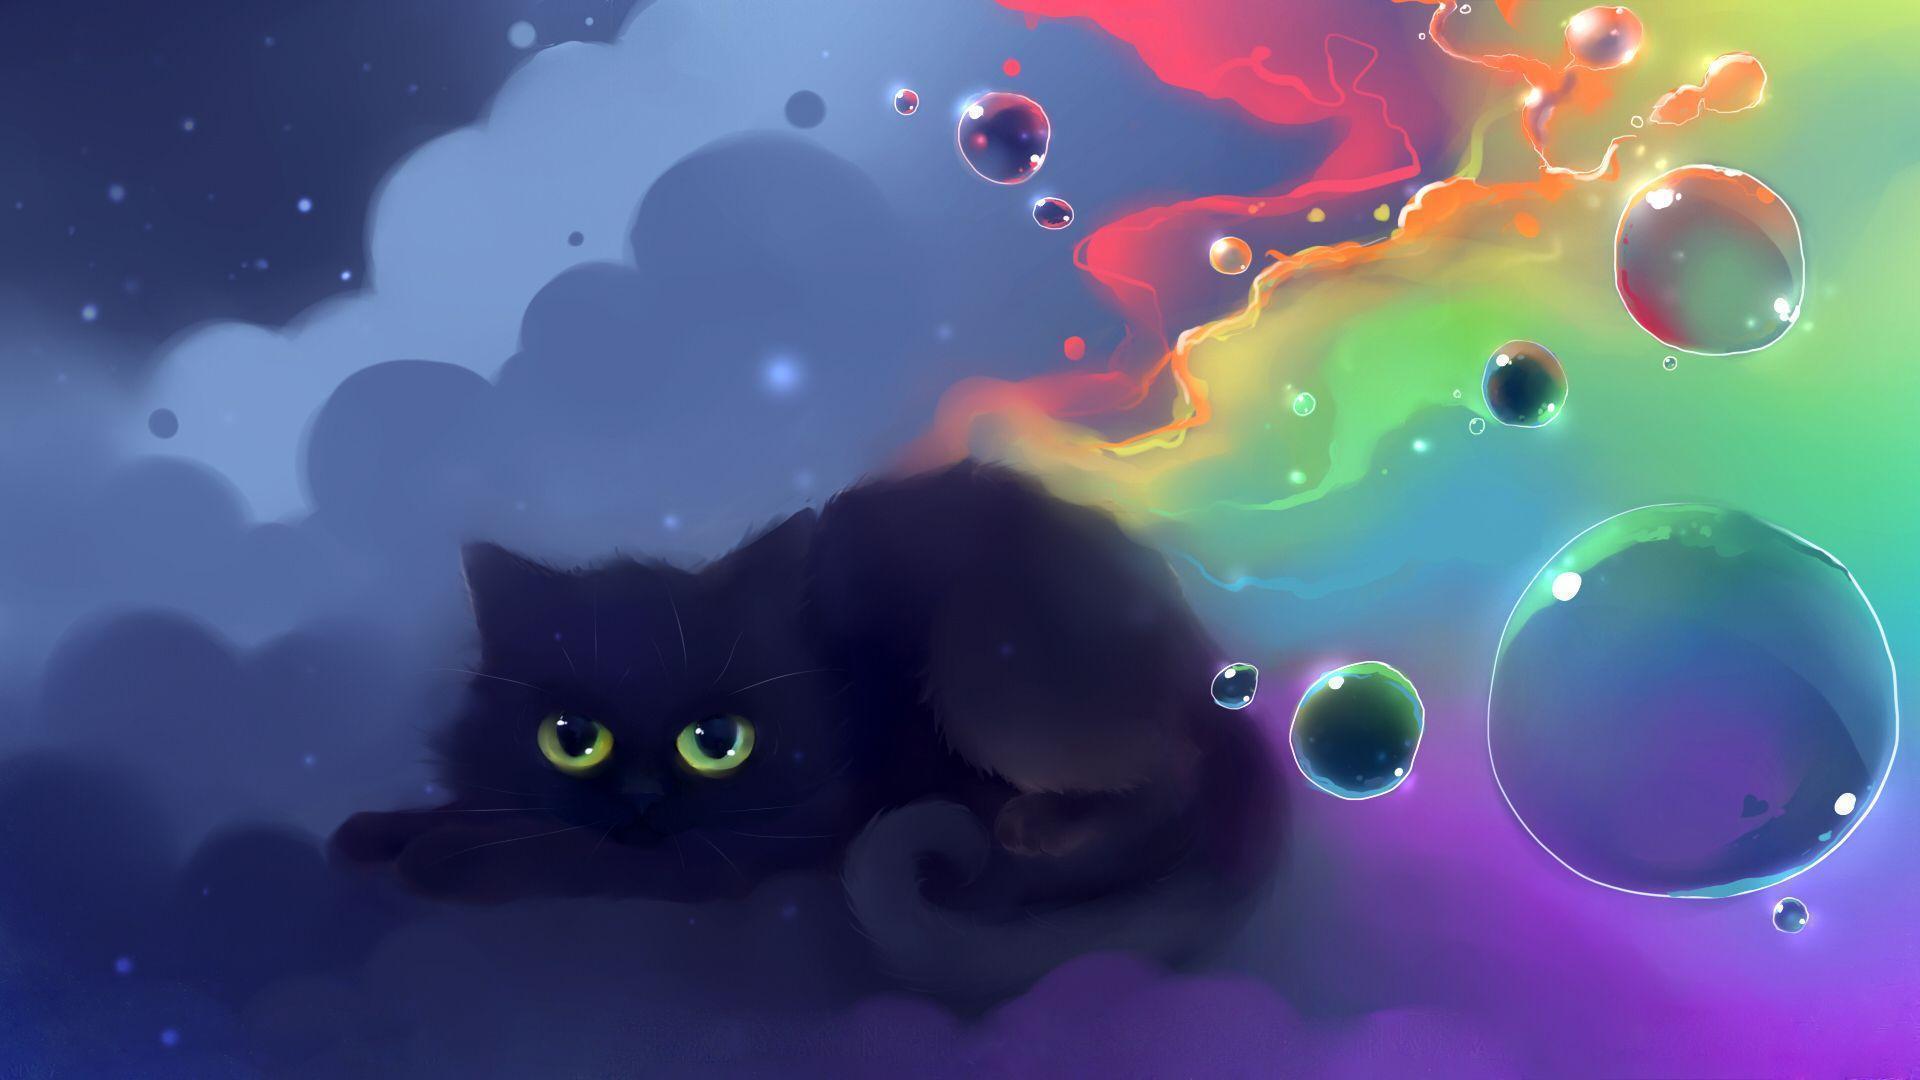 Nyan Cat Wallpapers Wallpaper Cave